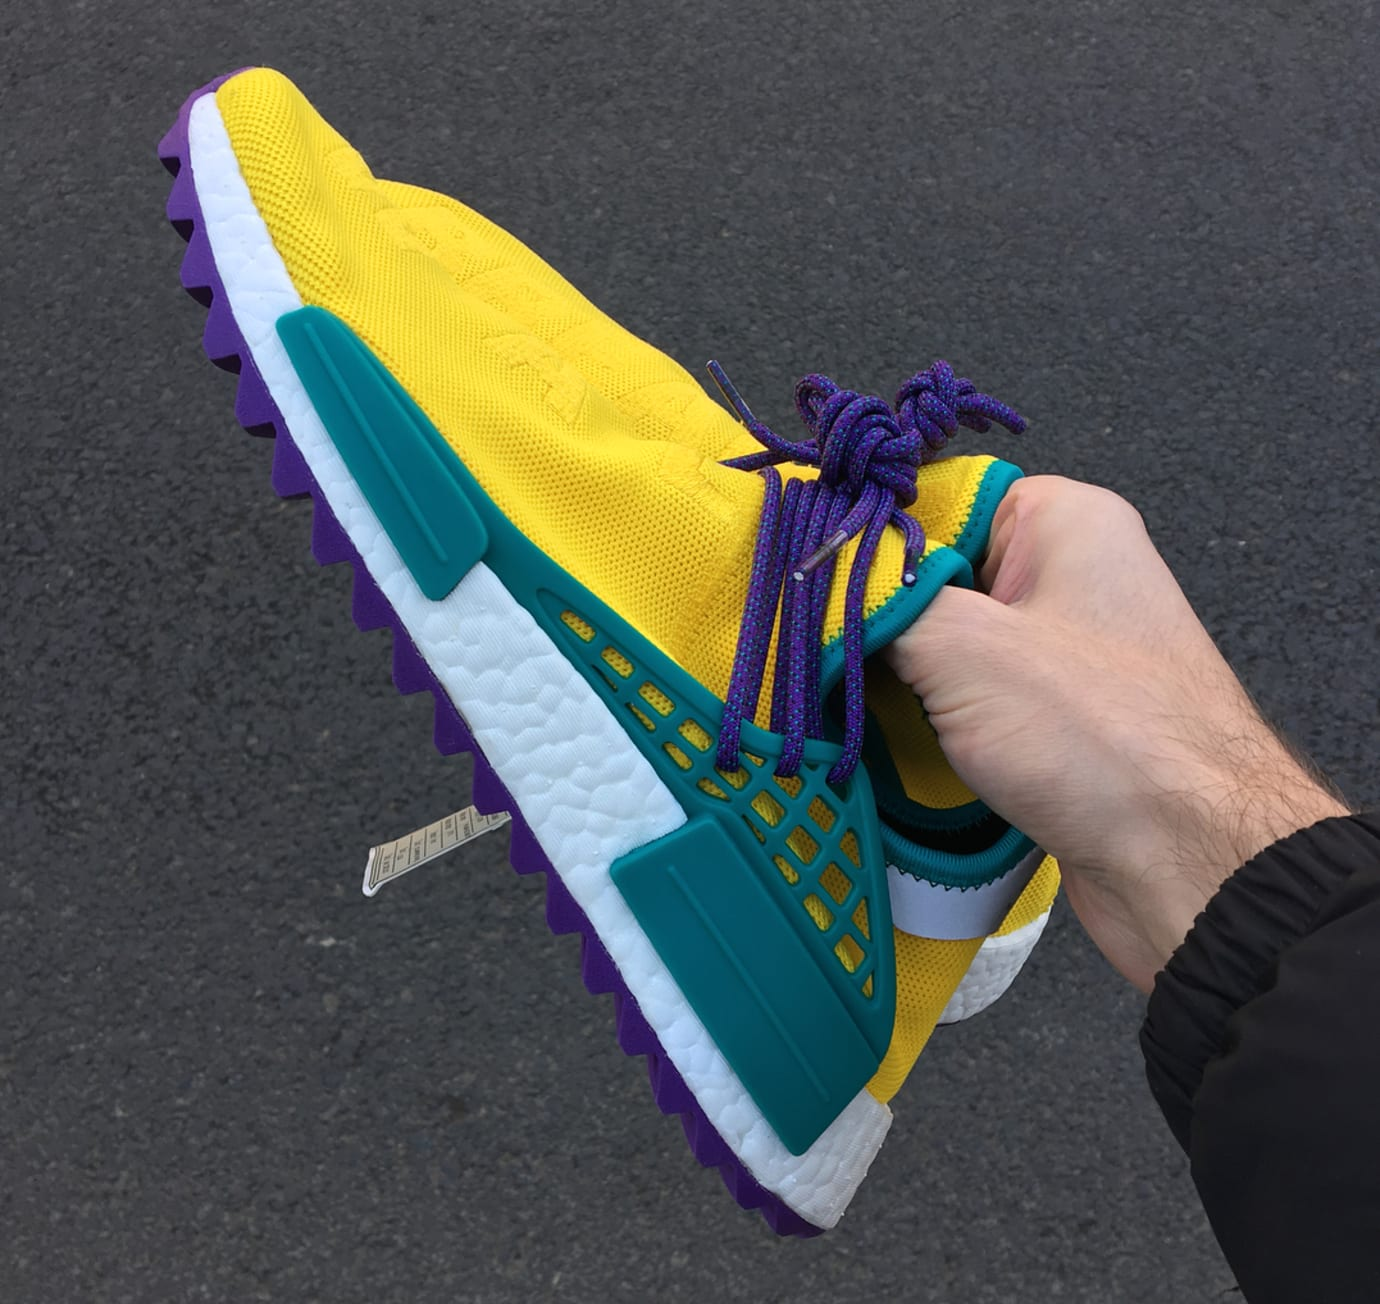 Pharrell x Adidas NMD Hu Breathe Walk Yellow Green Purple Heel